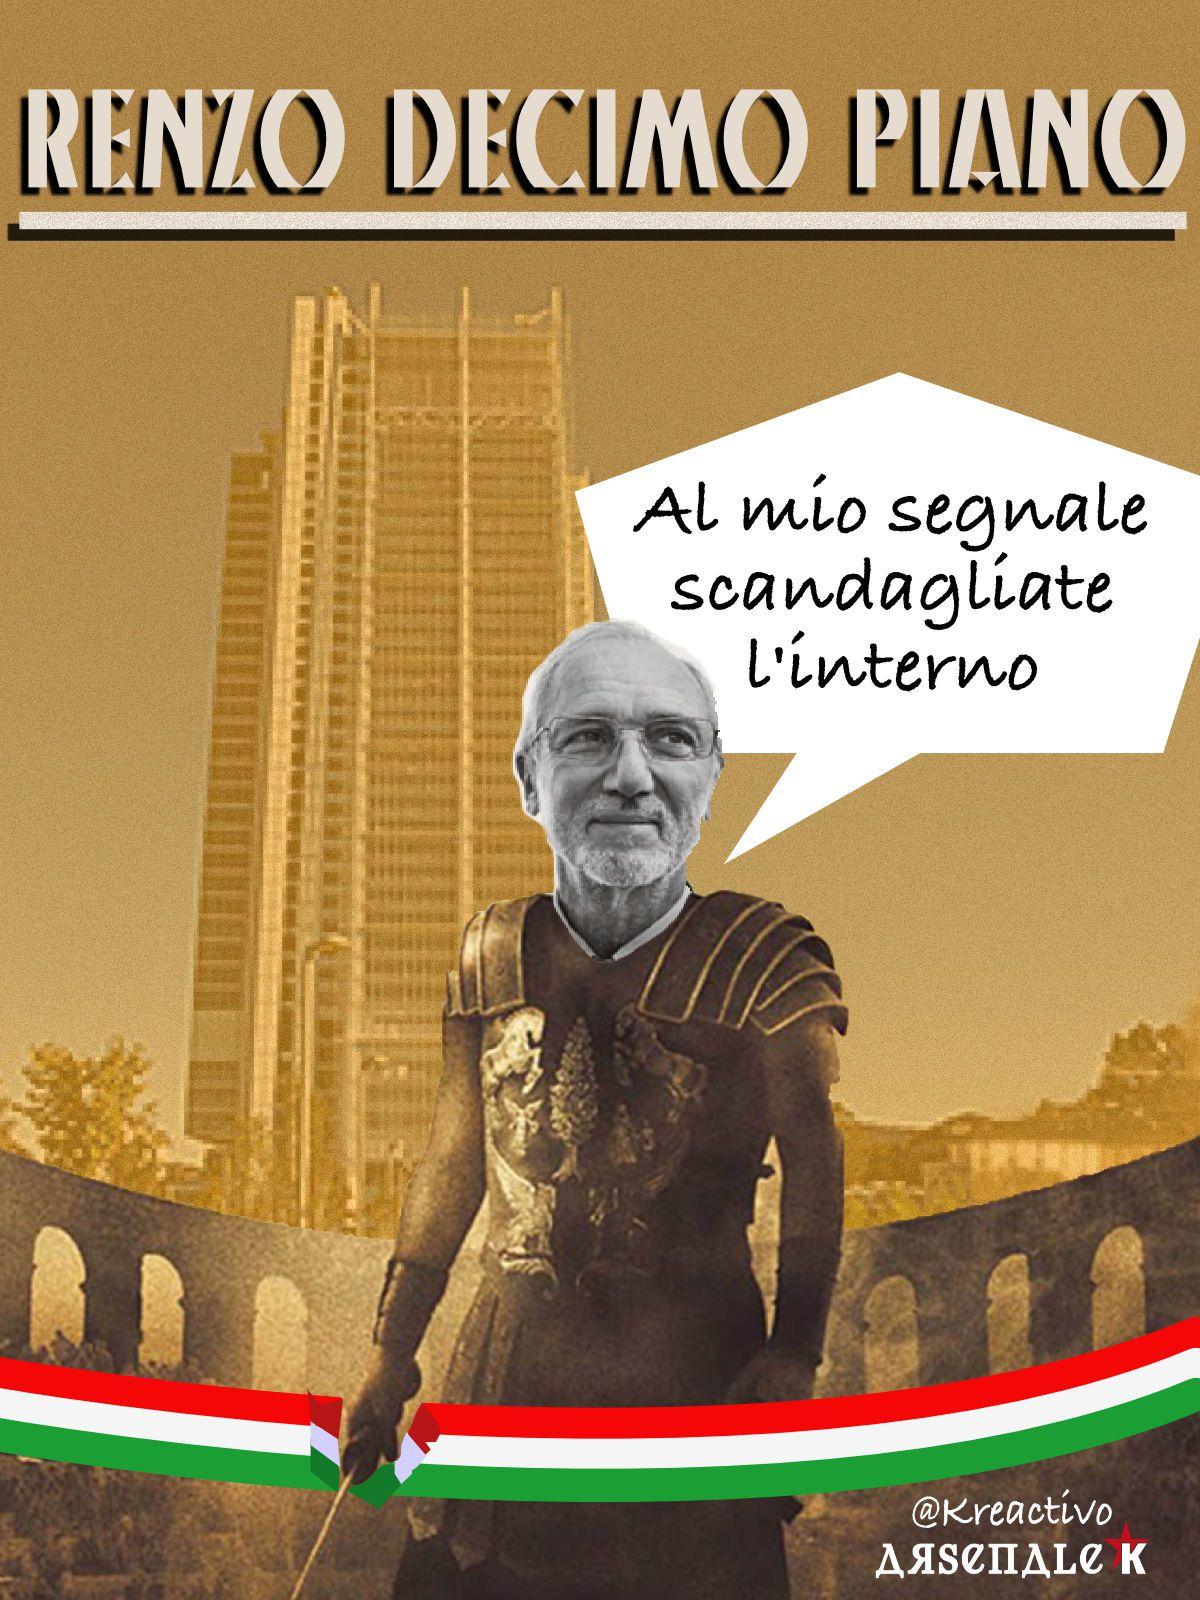 Renzo Decimo Piano